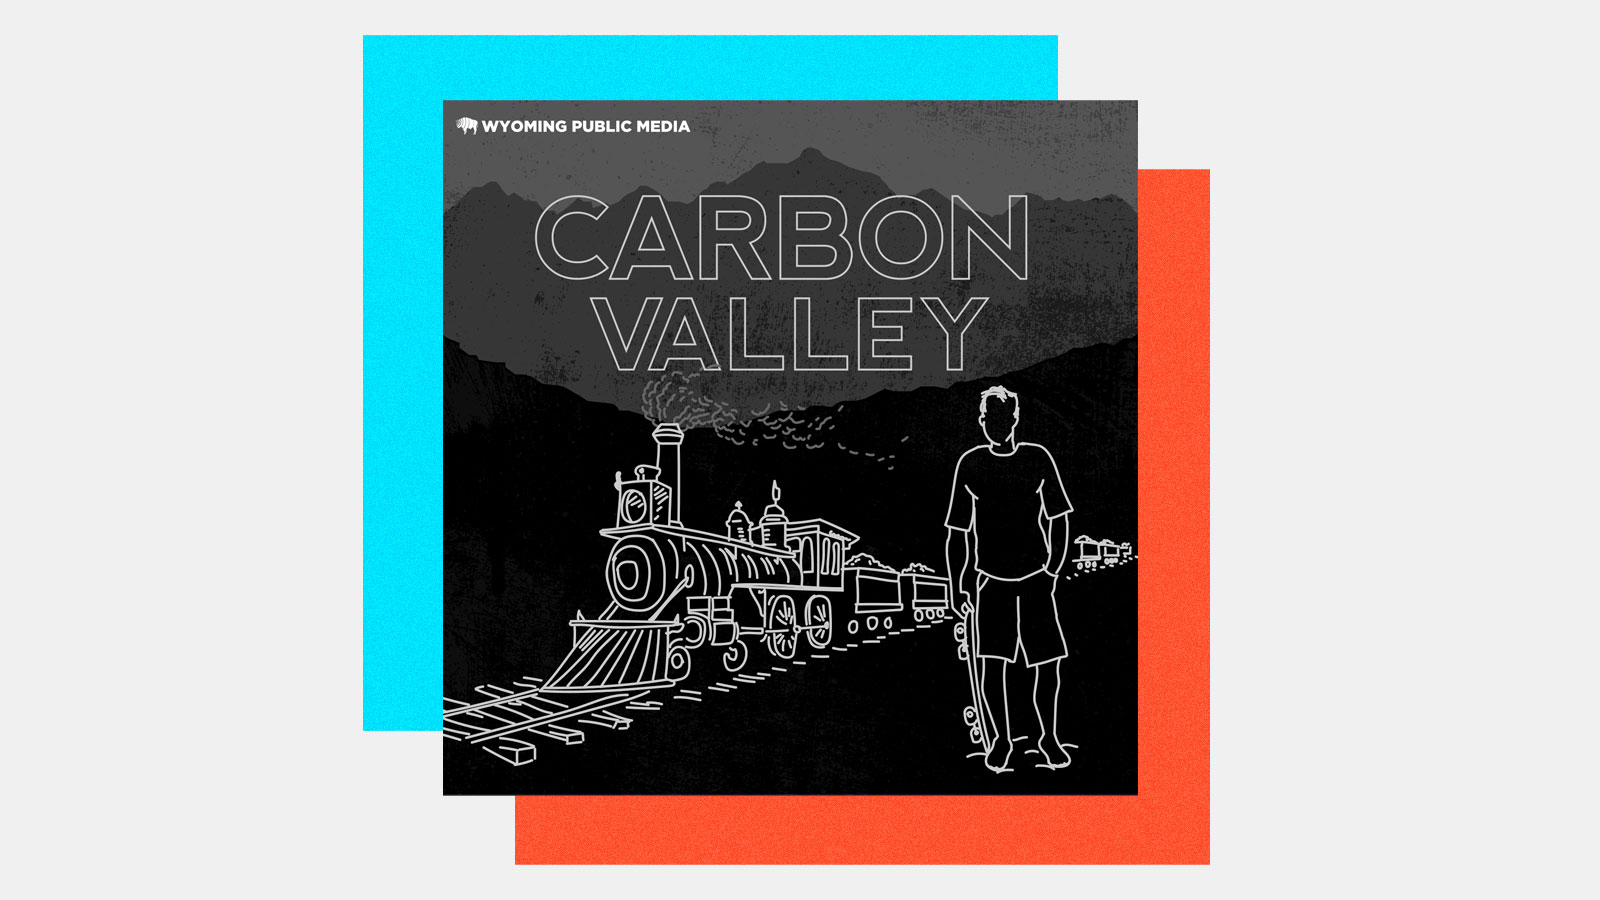 black and white image of a train hauling coal